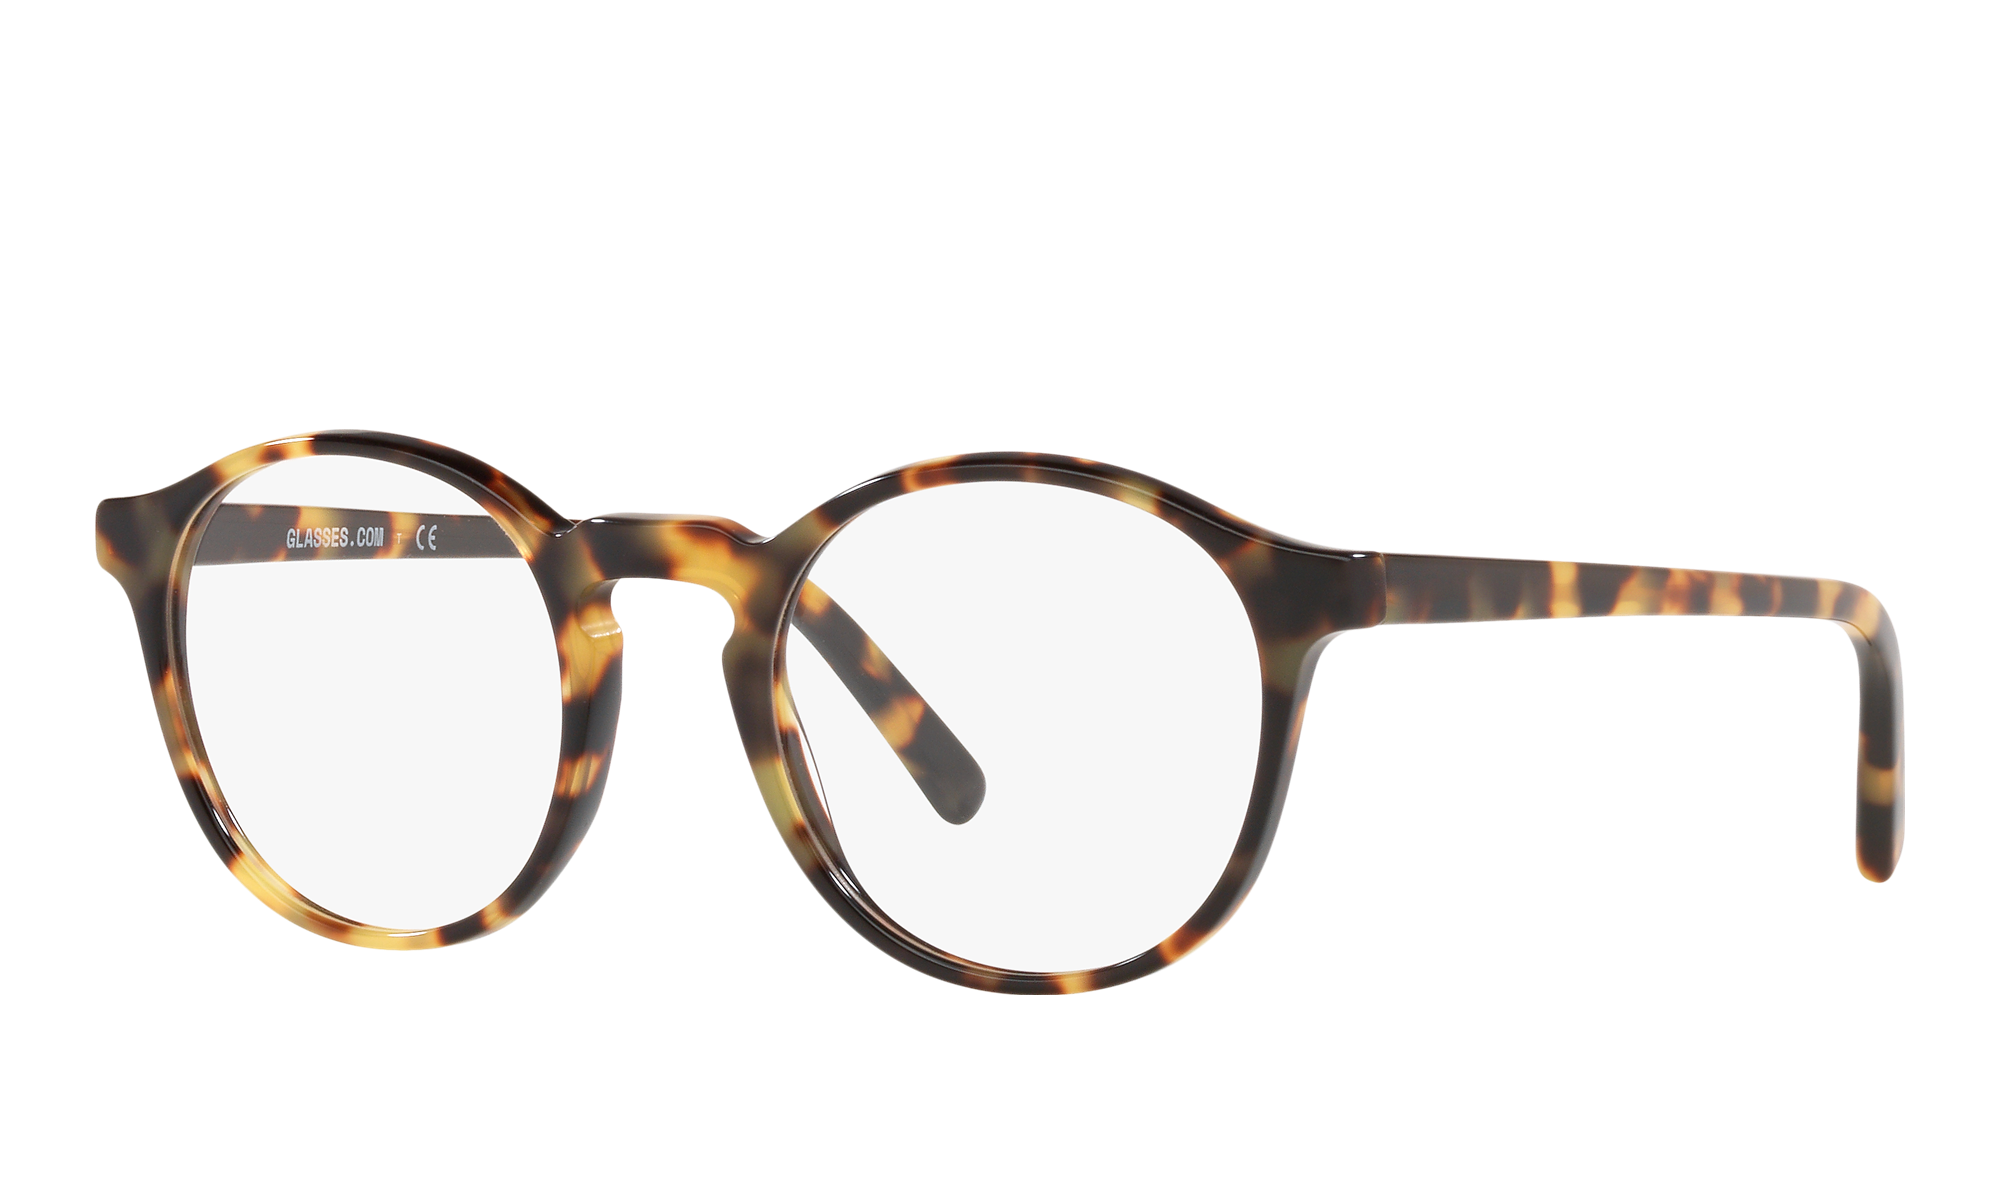 Retro Sunglasses | Vintage Glasses | New Vintage Eyeglasses GLASSES.COM Unisex Gl006 Round And Round Tortoise Size Standard $55.00 AT vintagedancer.com